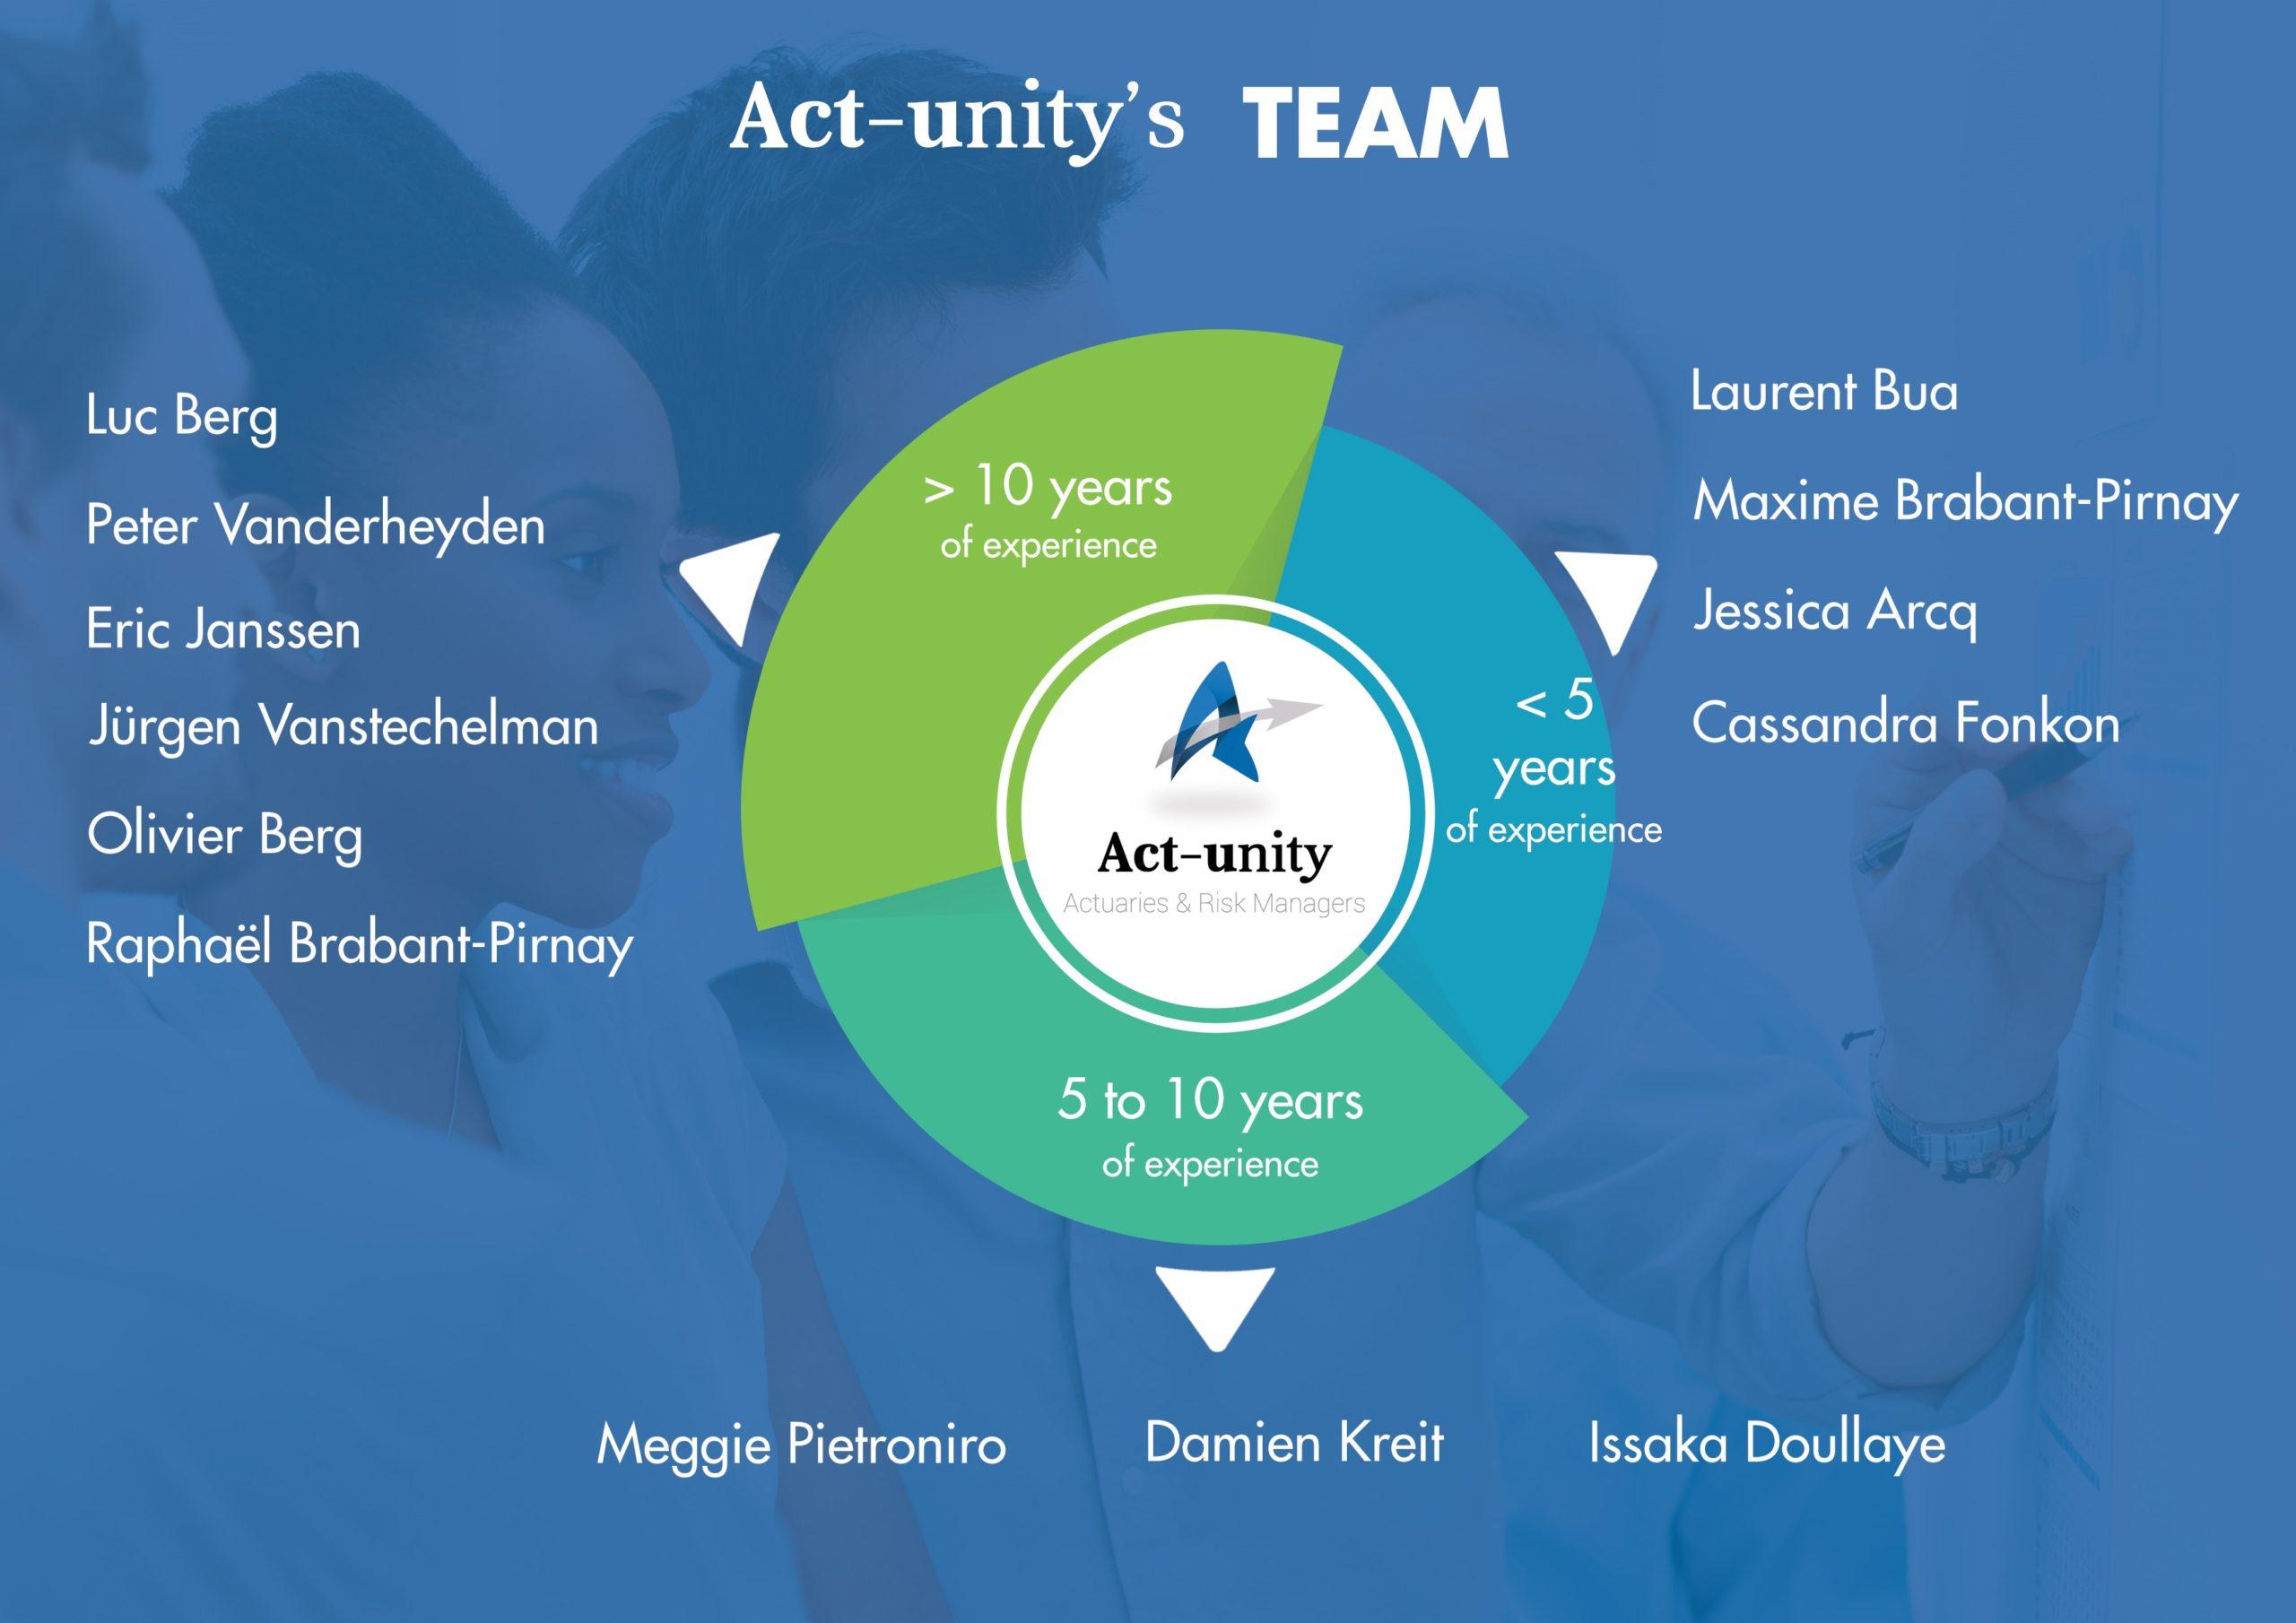 act-unity_team_2020